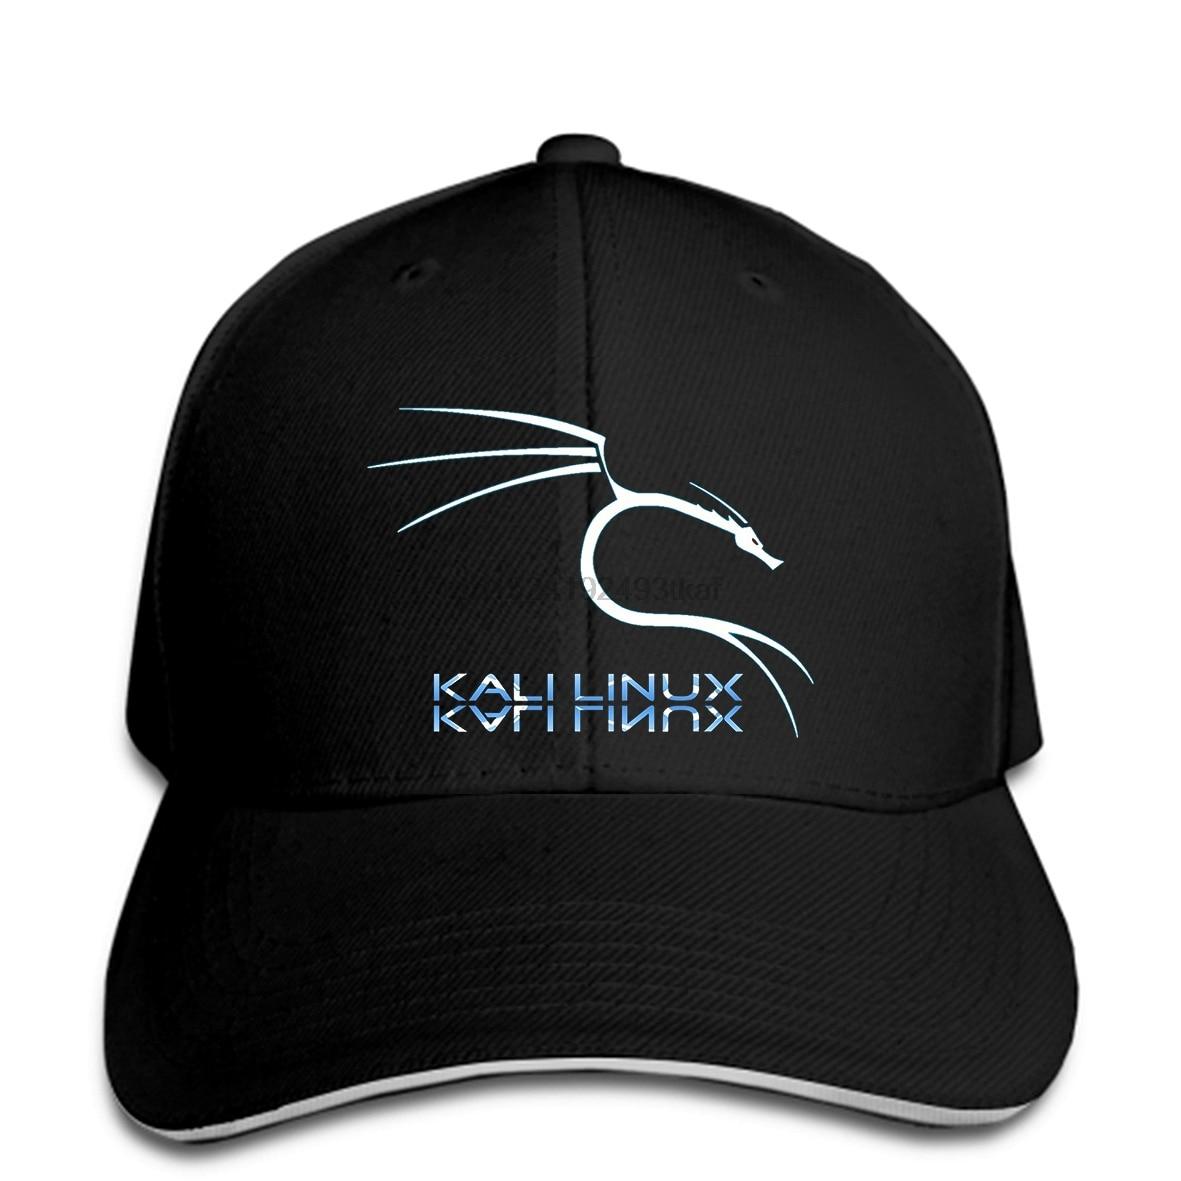 Gorra de béisbol Kali Linux sombrero de dragón